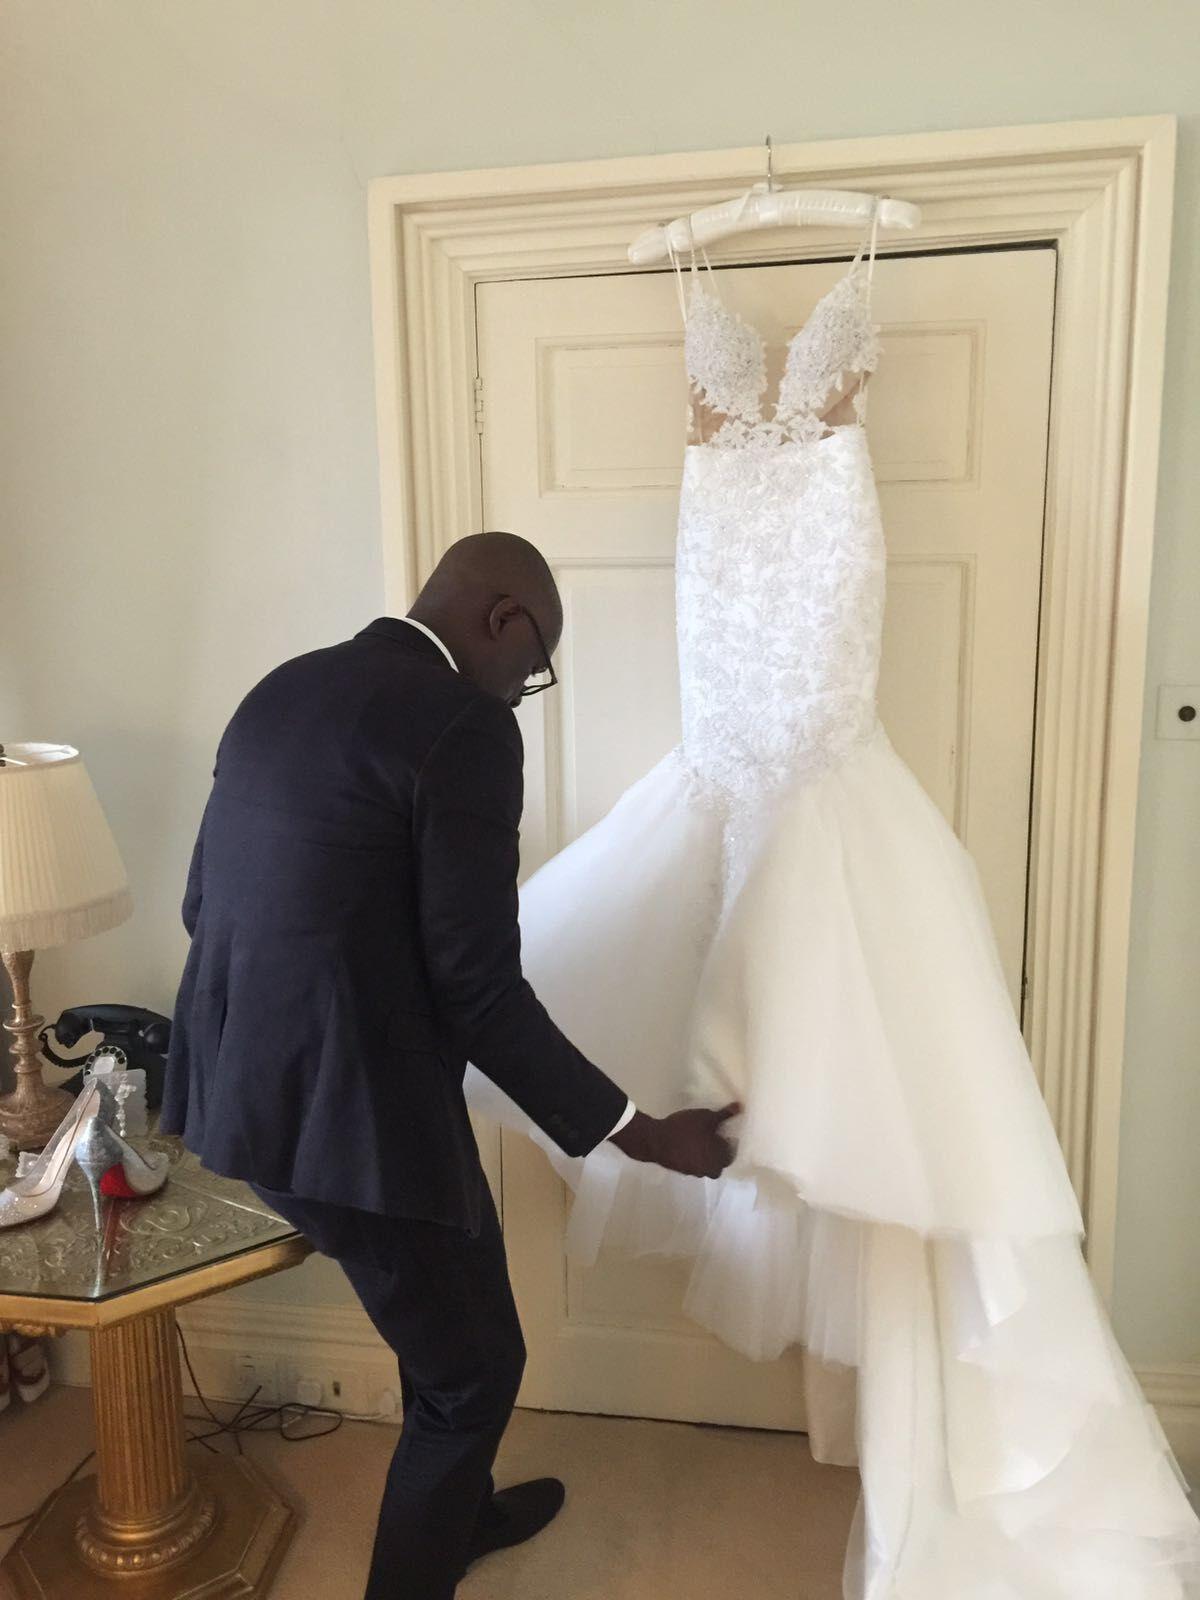 Designer Yemi Osunkoya at work on a bride's big day